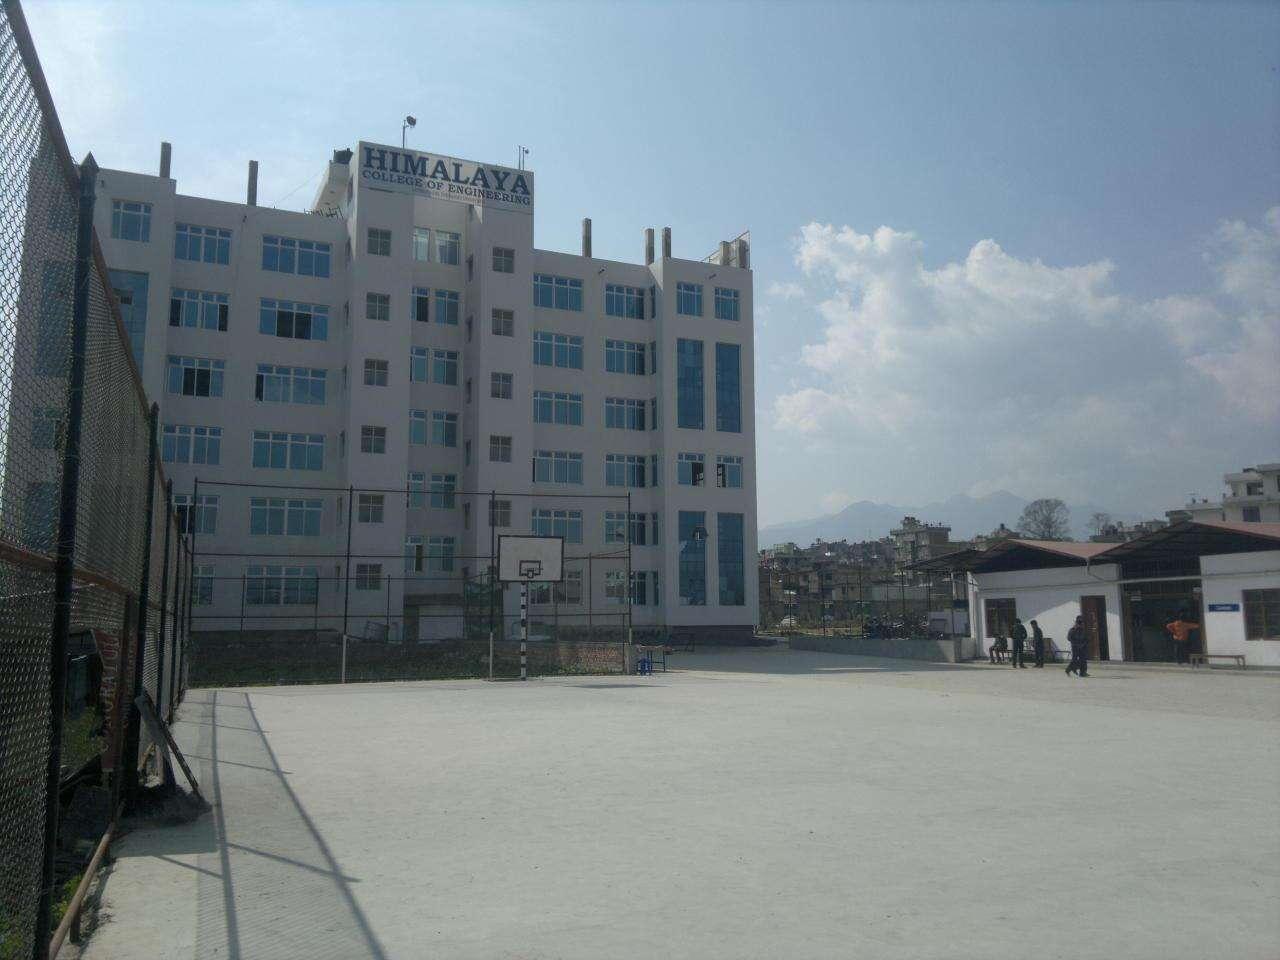 Himalaya College of Engineering (TU)